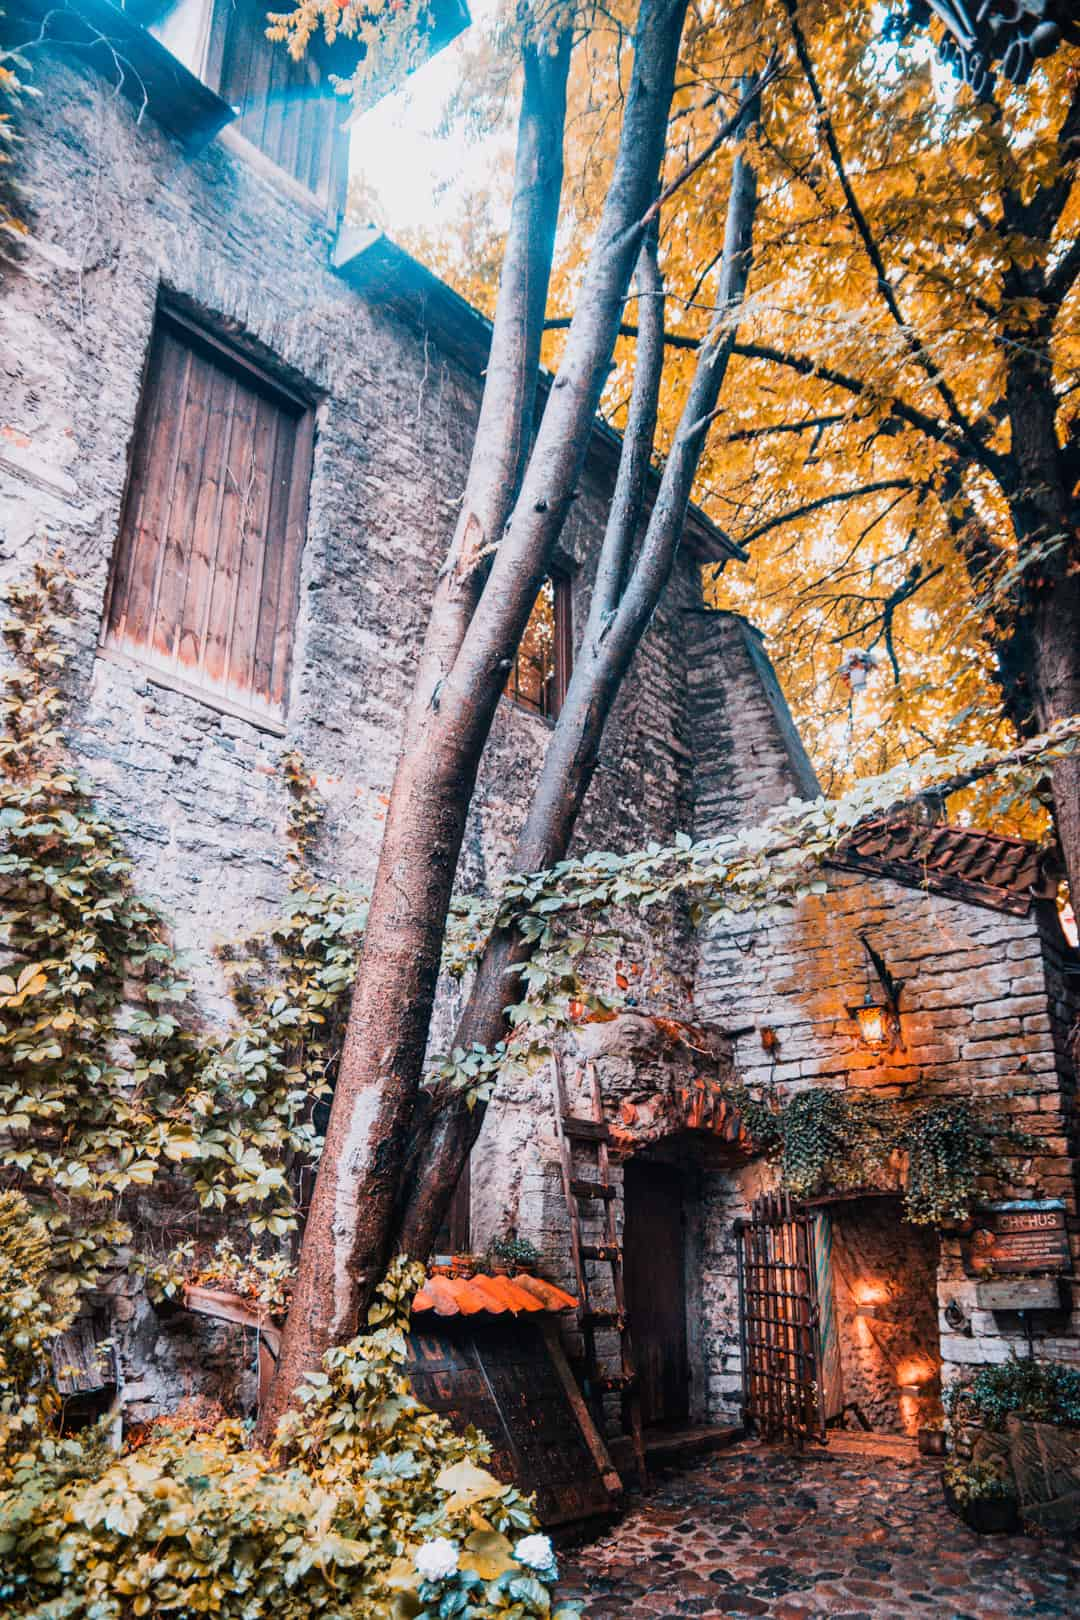 Talinn 201922 - Tallinn bezienswaardigheden: 16x wat te doen tijdens je stedentrip! (+ restaurant tips)